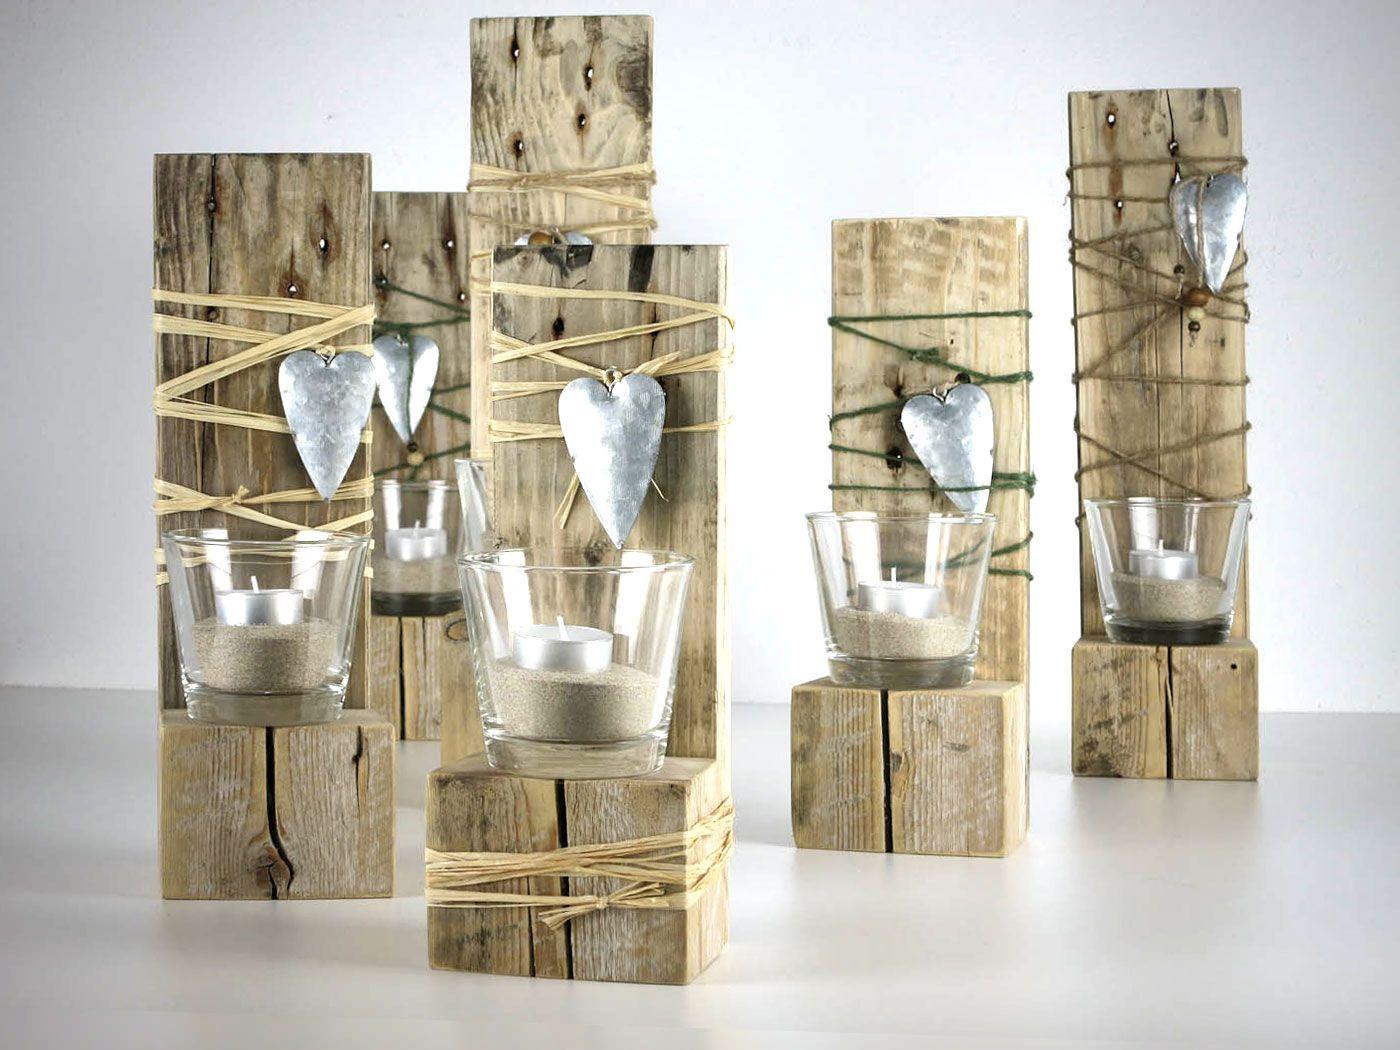 teelicht deko palettenholz kreativ pinterest holz basteln und basteln mit holz. Black Bedroom Furniture Sets. Home Design Ideas